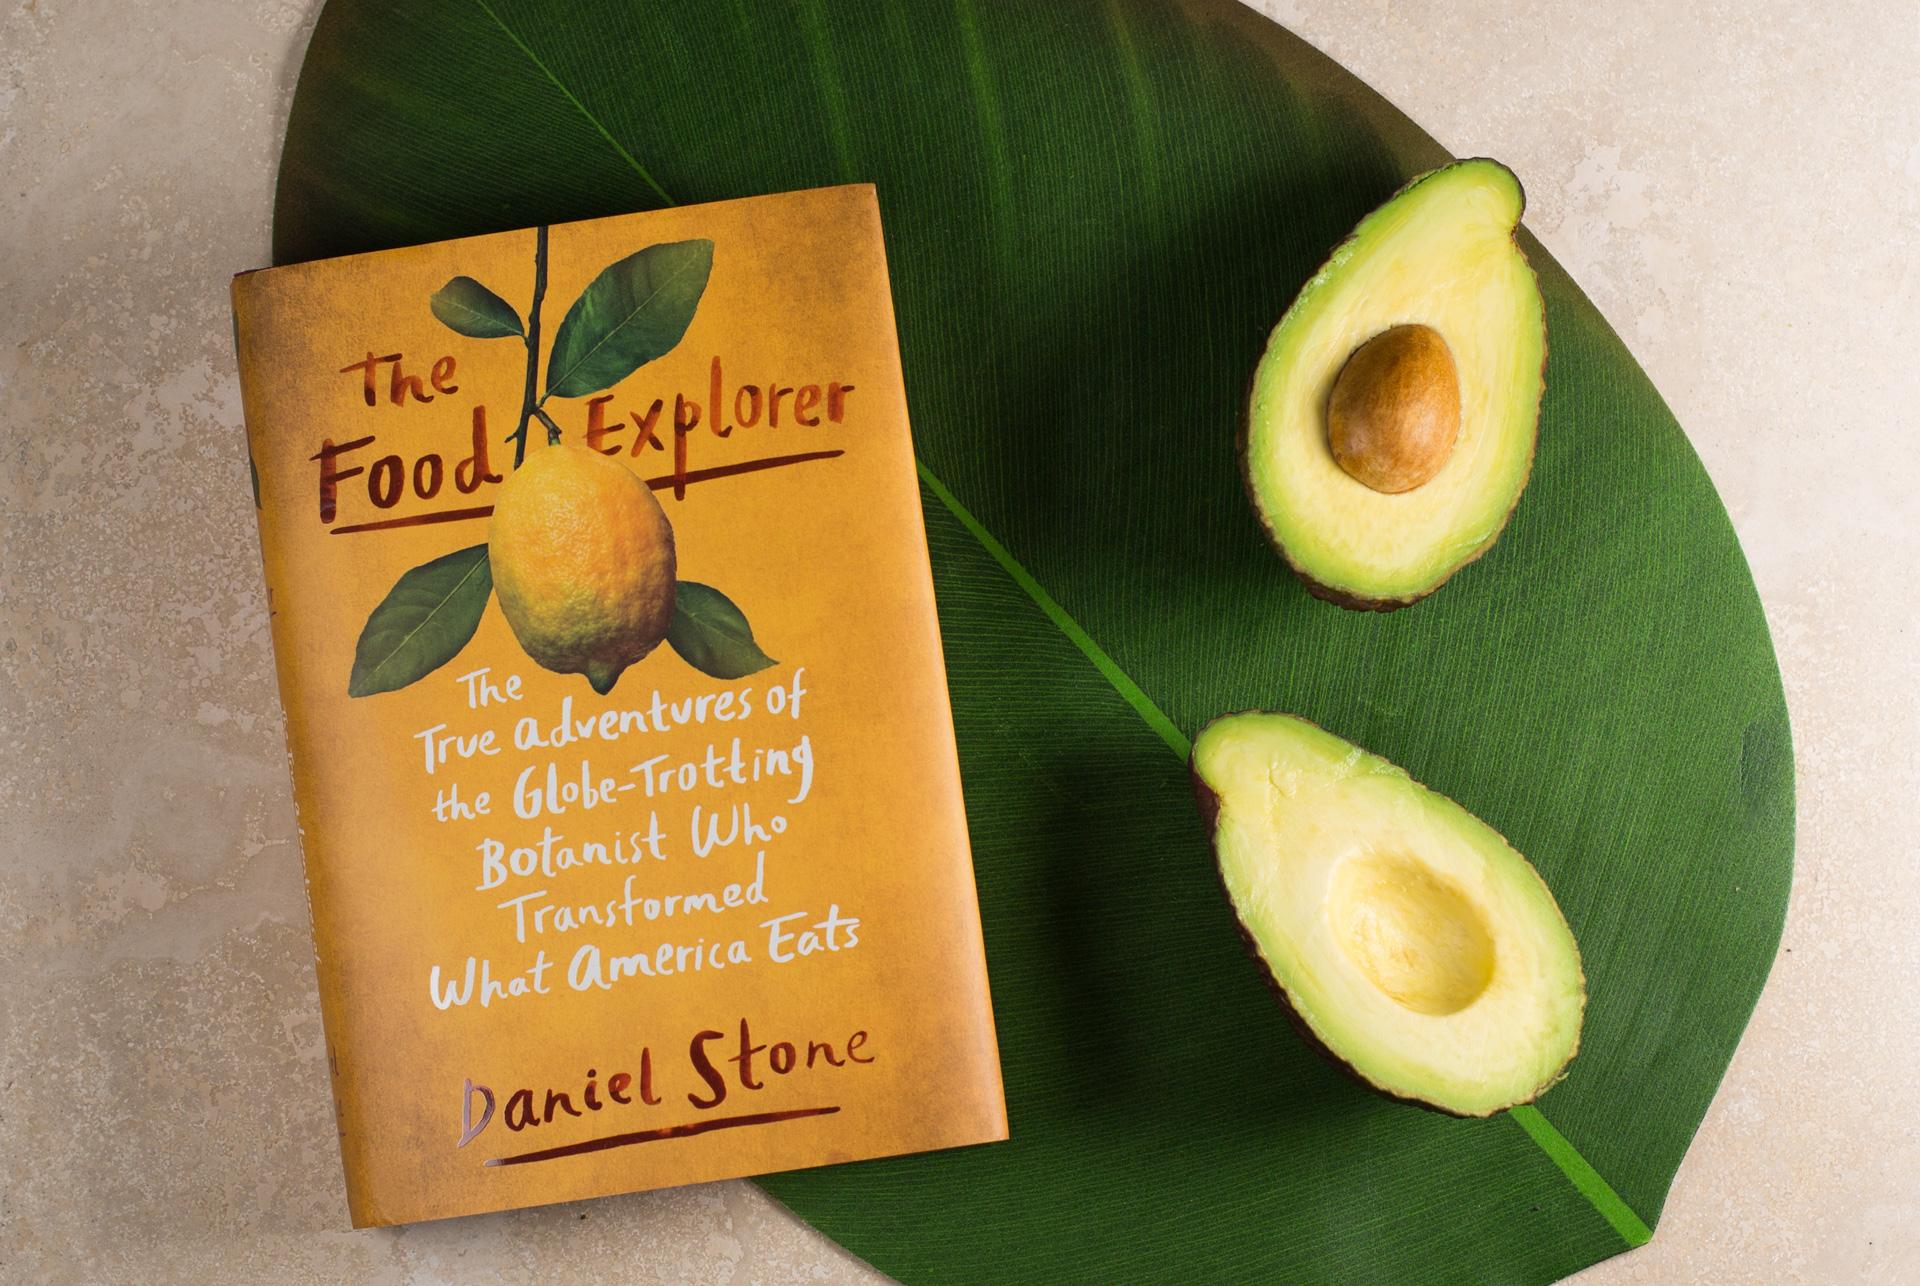 Avocaderia_The Food Explorer.jpg